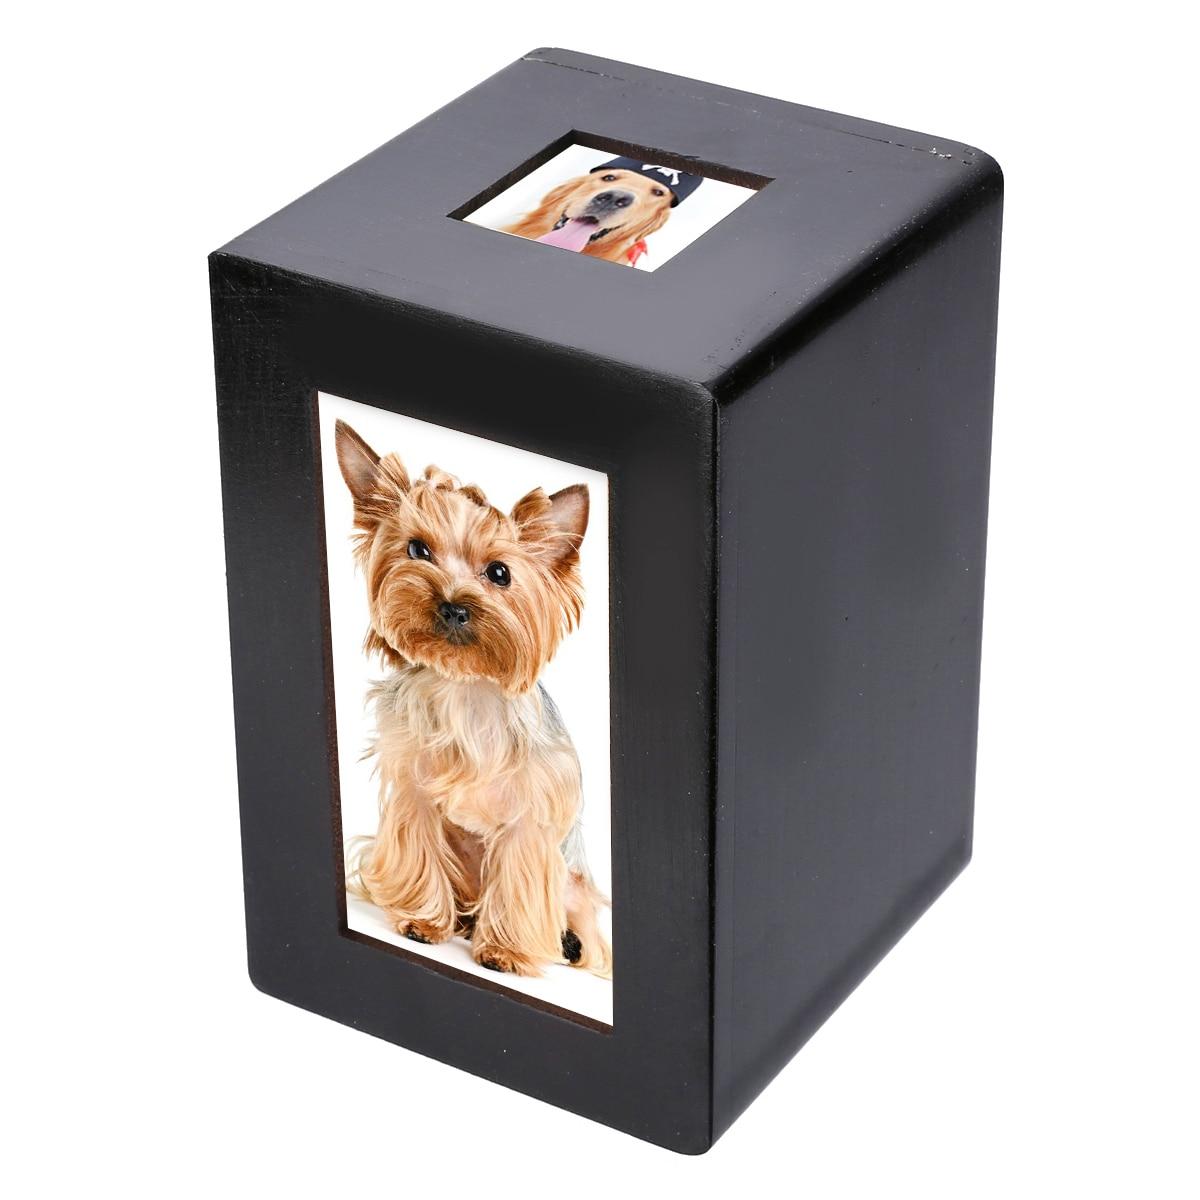 Mayitr caja de urna de madera negra para mascotas, urna de cremación para perros, marco de foto conmemorativo pacífico, caja para guardar en casa para perros silenciosos